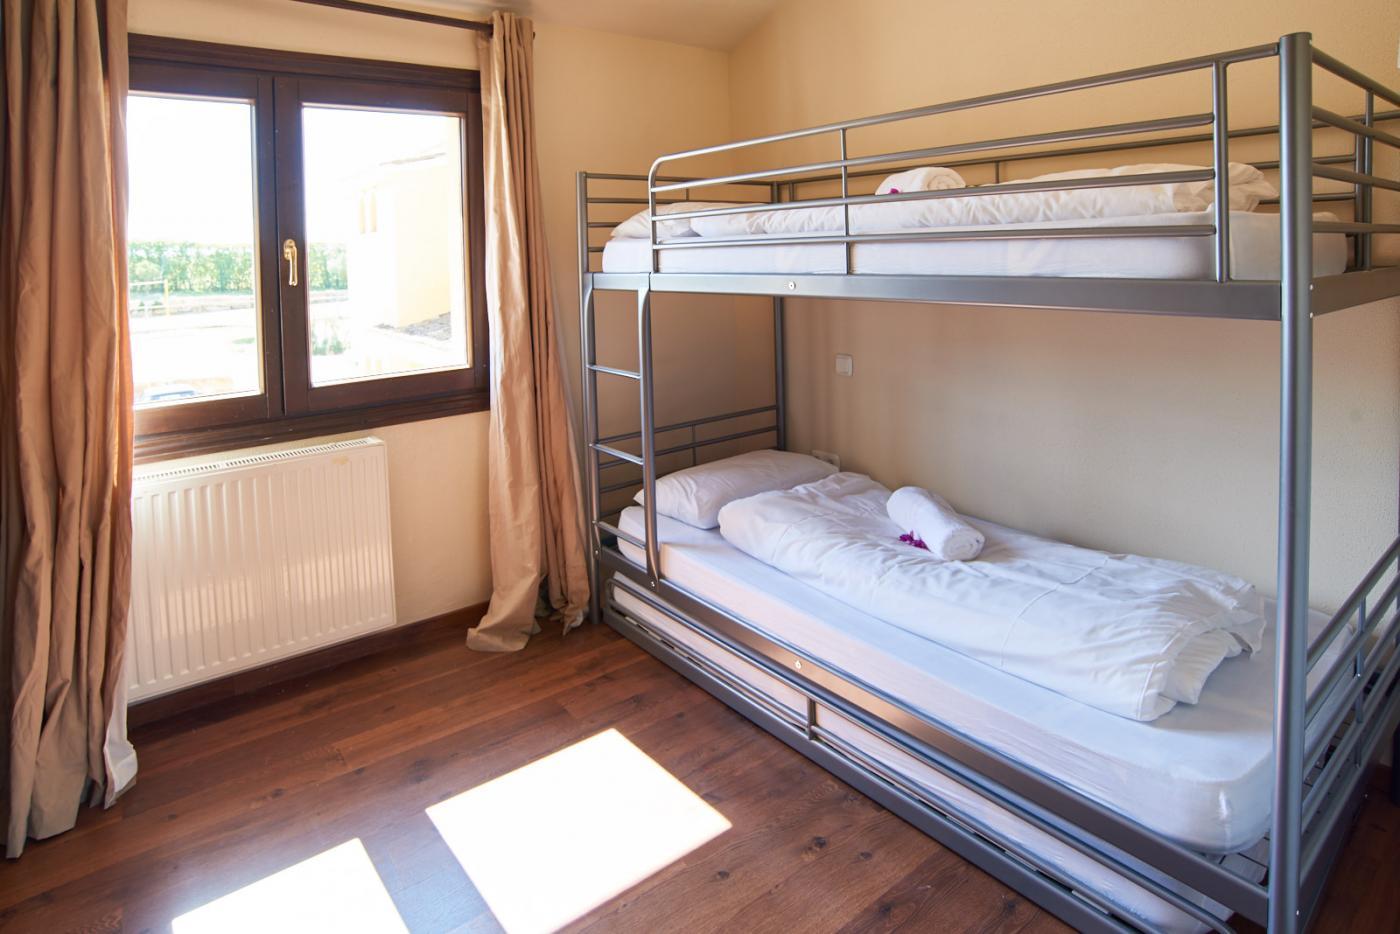 11 Bedroom Equestrian for Sale in Casares